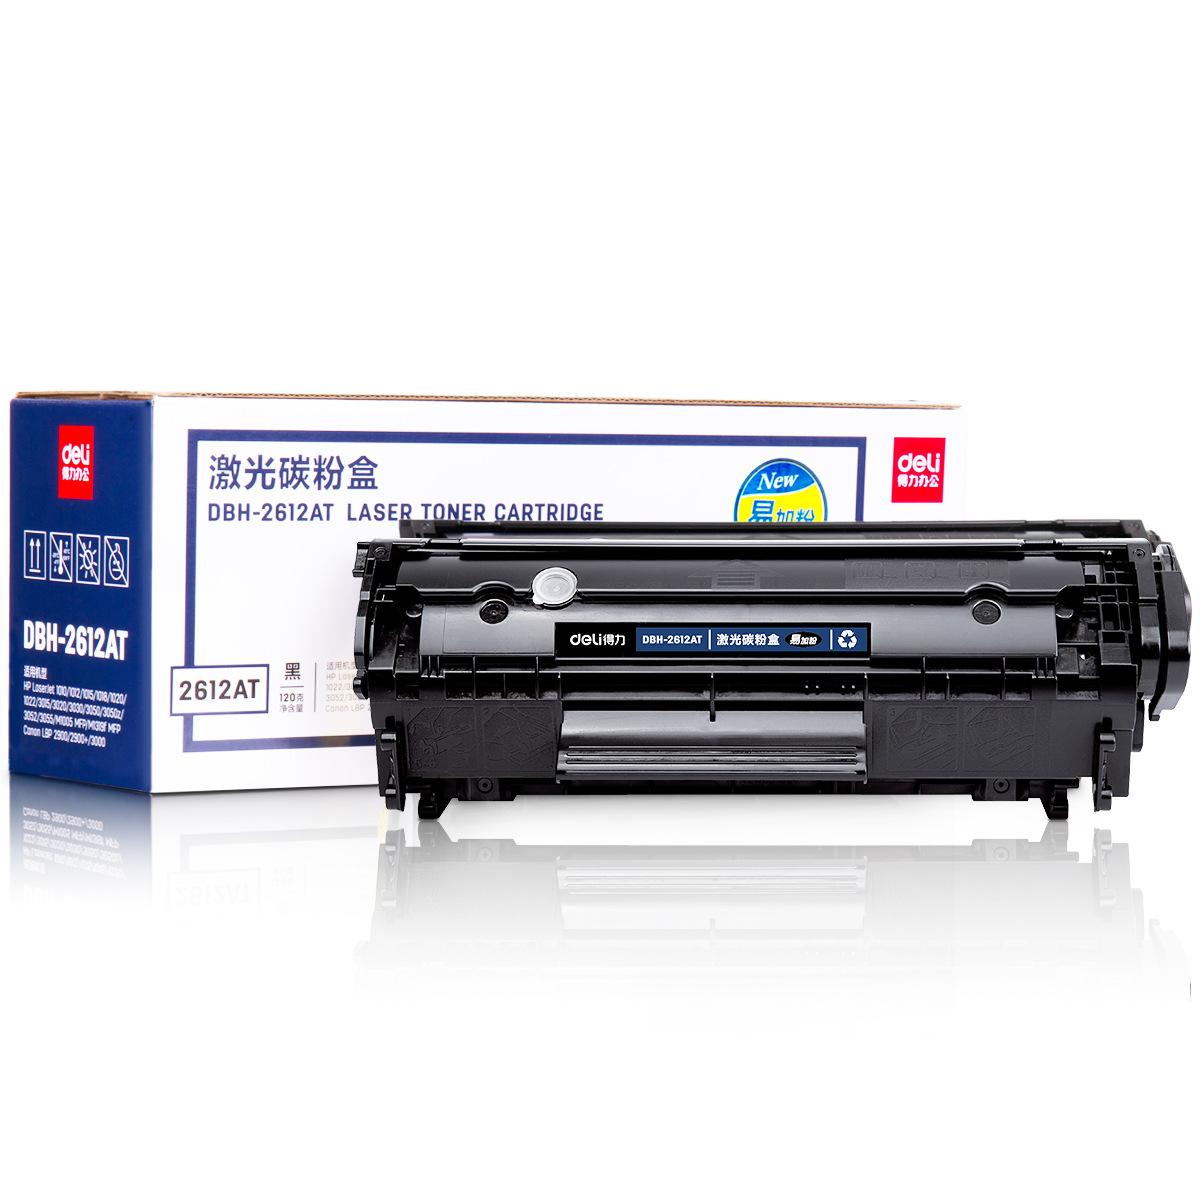 DELI Hộp mực than Máy in laser văn phòng hiệu quả DBH-2612AT hộp mực máy in laser HP1020 HP1005 HP10